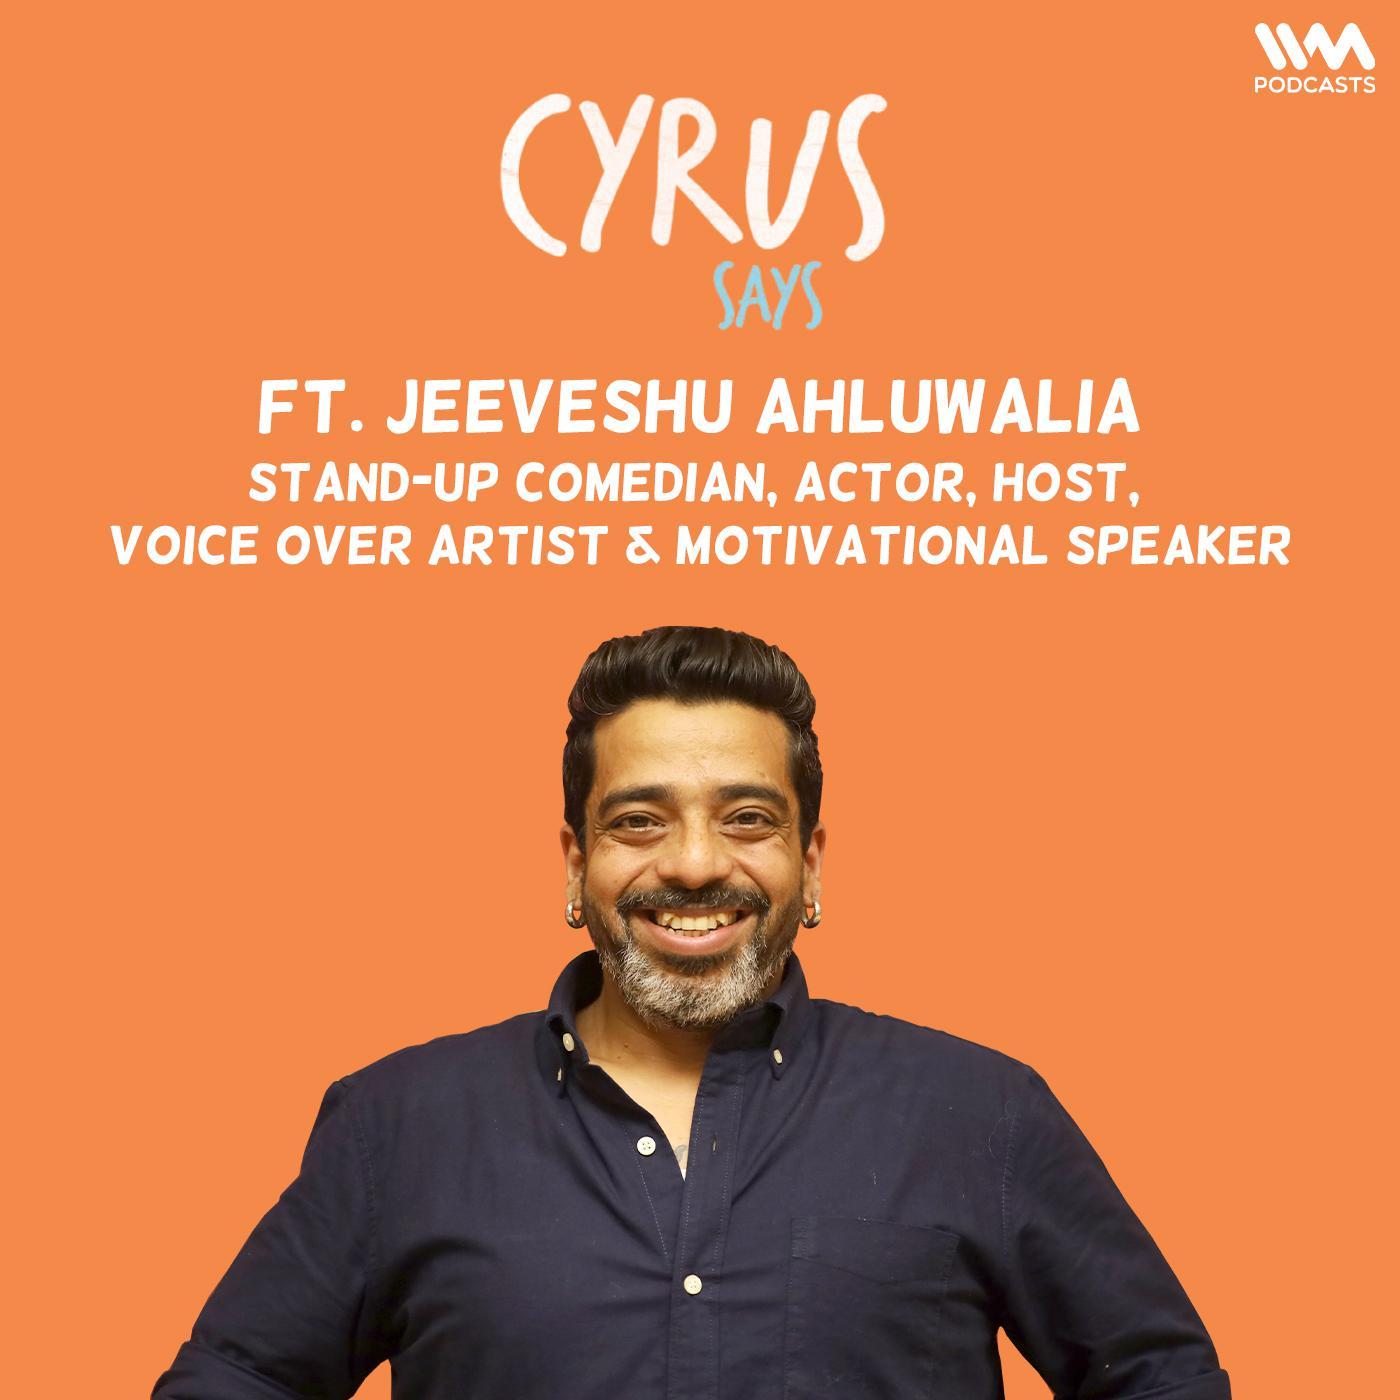 Ep. 682: feat. Jeeveshu Ahluwalia